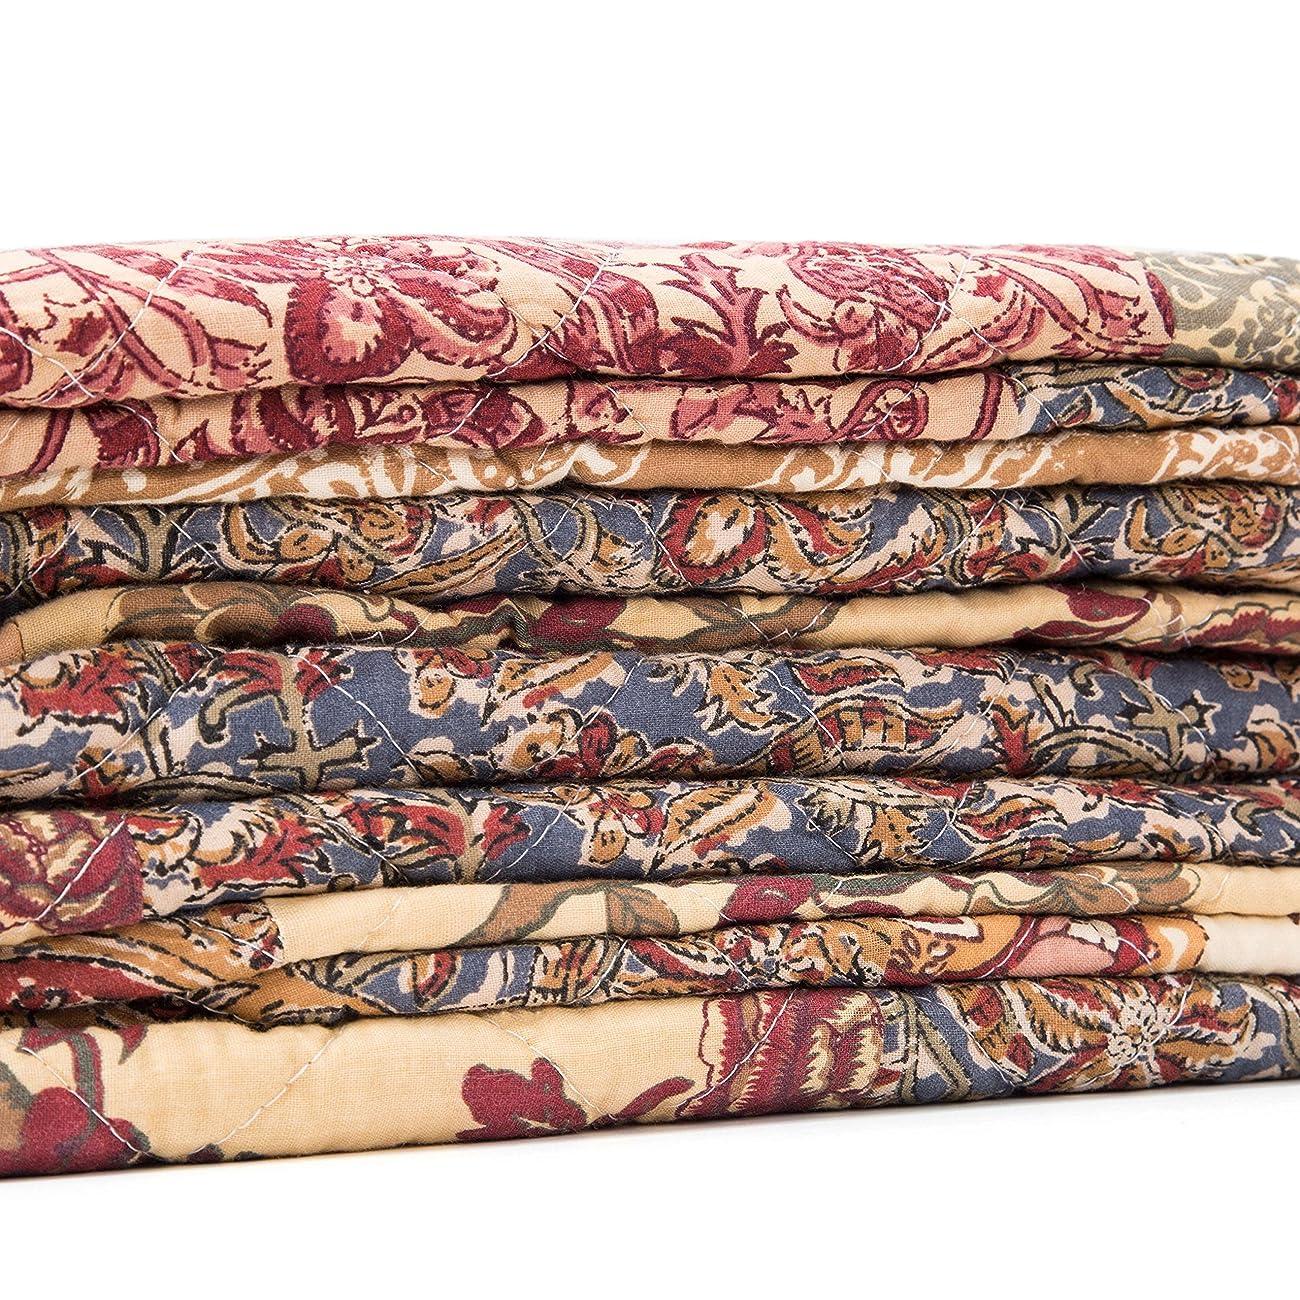 Luxury Retro Floral Stitching Cotton Patchwork Bedspread Sets Quilt Queen Size 4